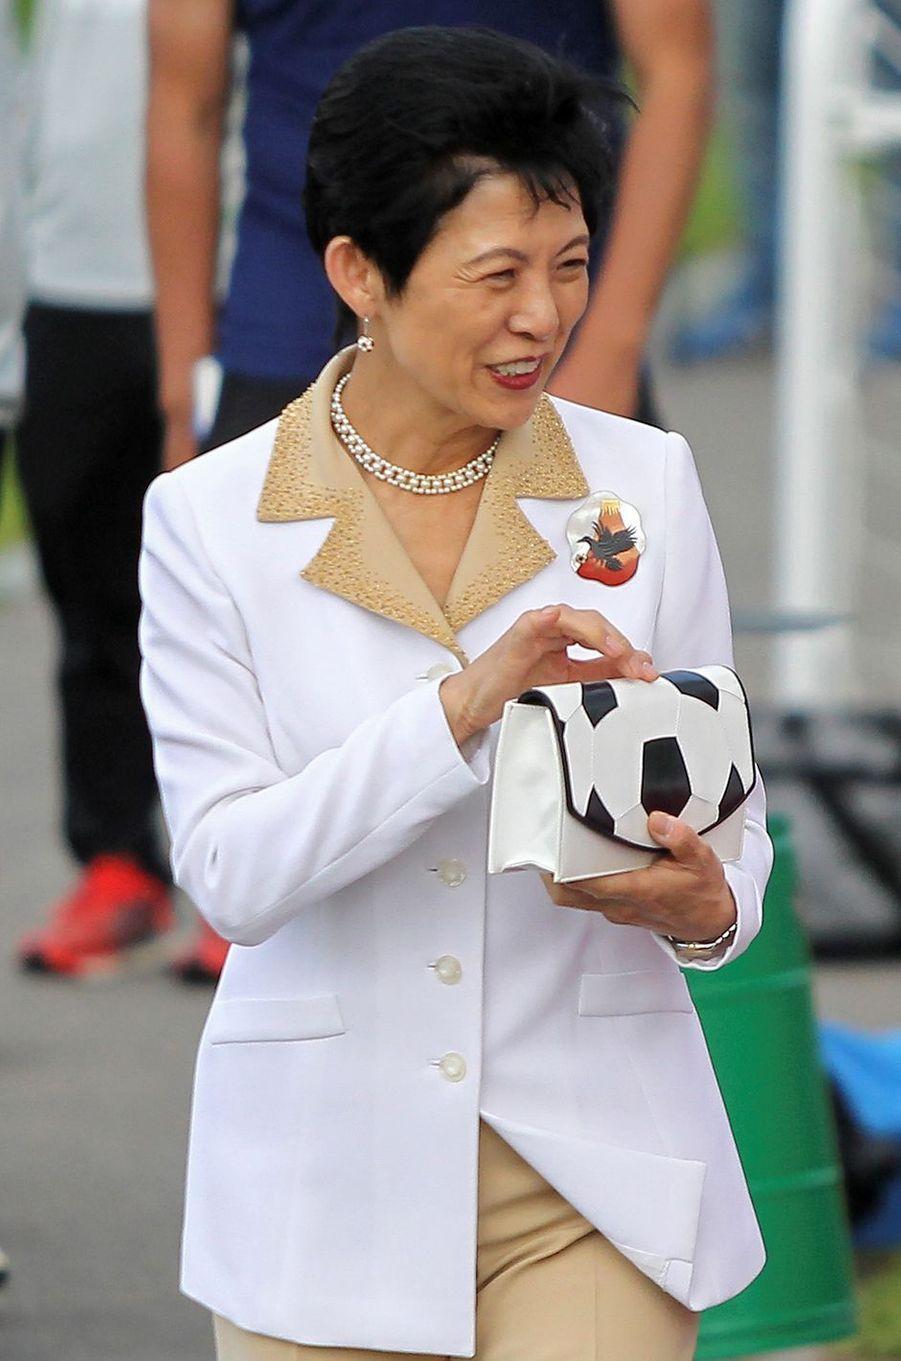 La princesse Hisako de Takamado à Kazan, le 21 juin 2018